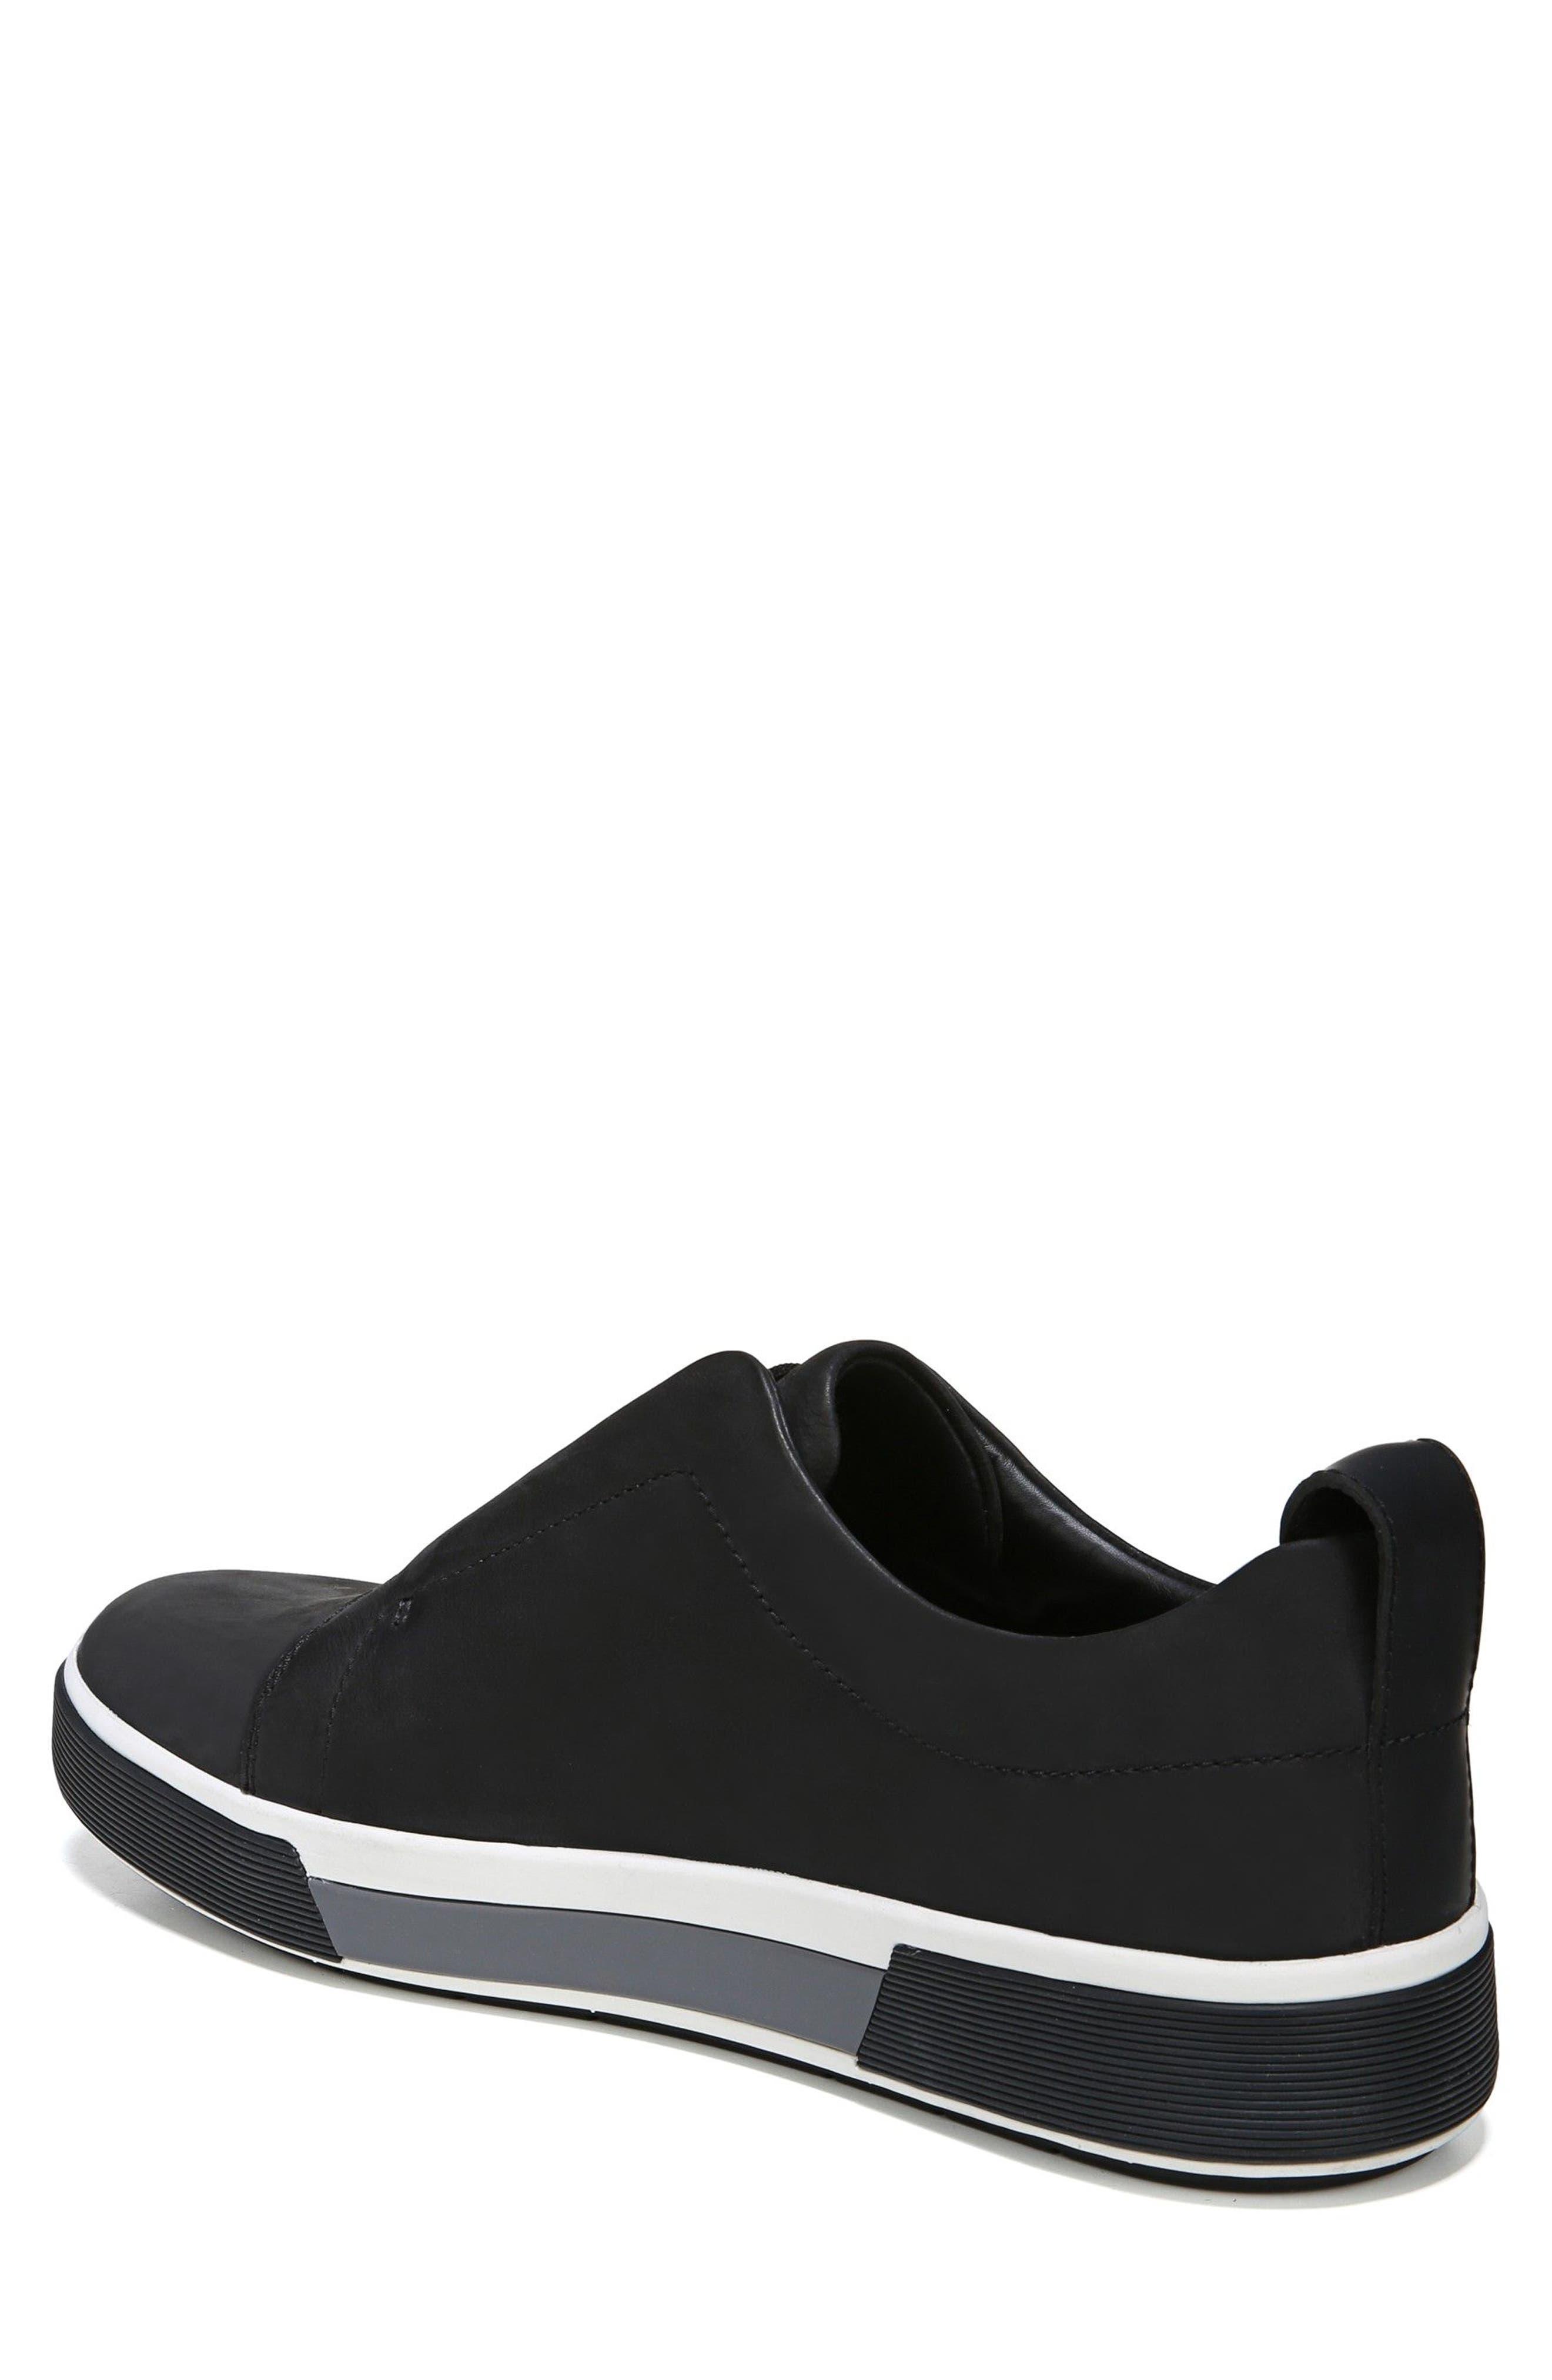 VINCE, Ranger Laceless Sneaker, Alternate thumbnail 2, color, BLACK